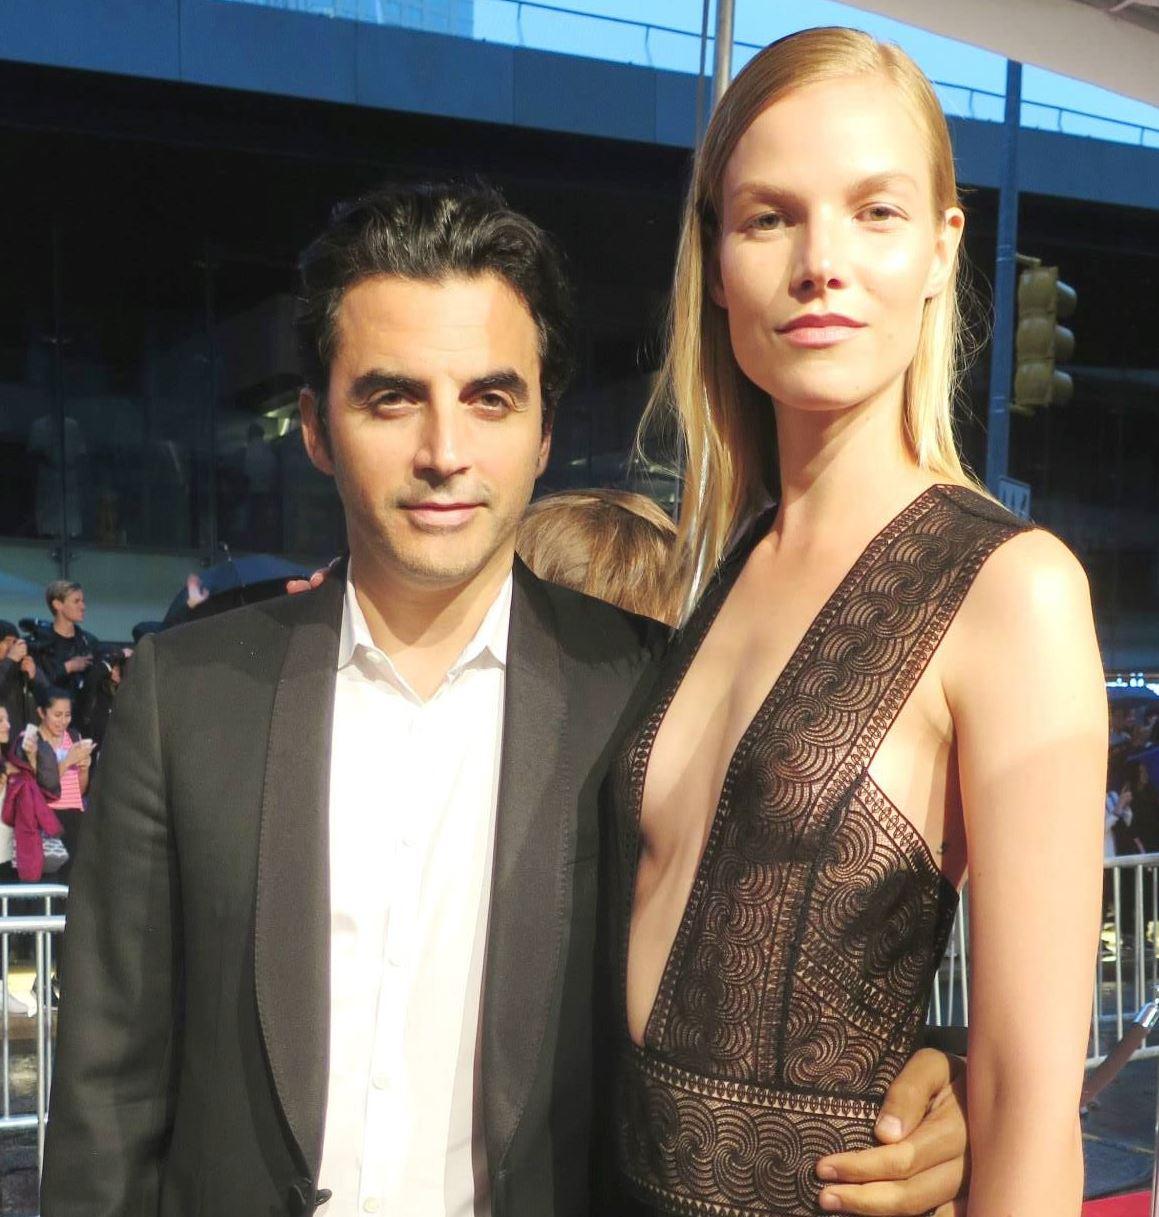 Israeli-American fashion designer Yigal Azrouël and model